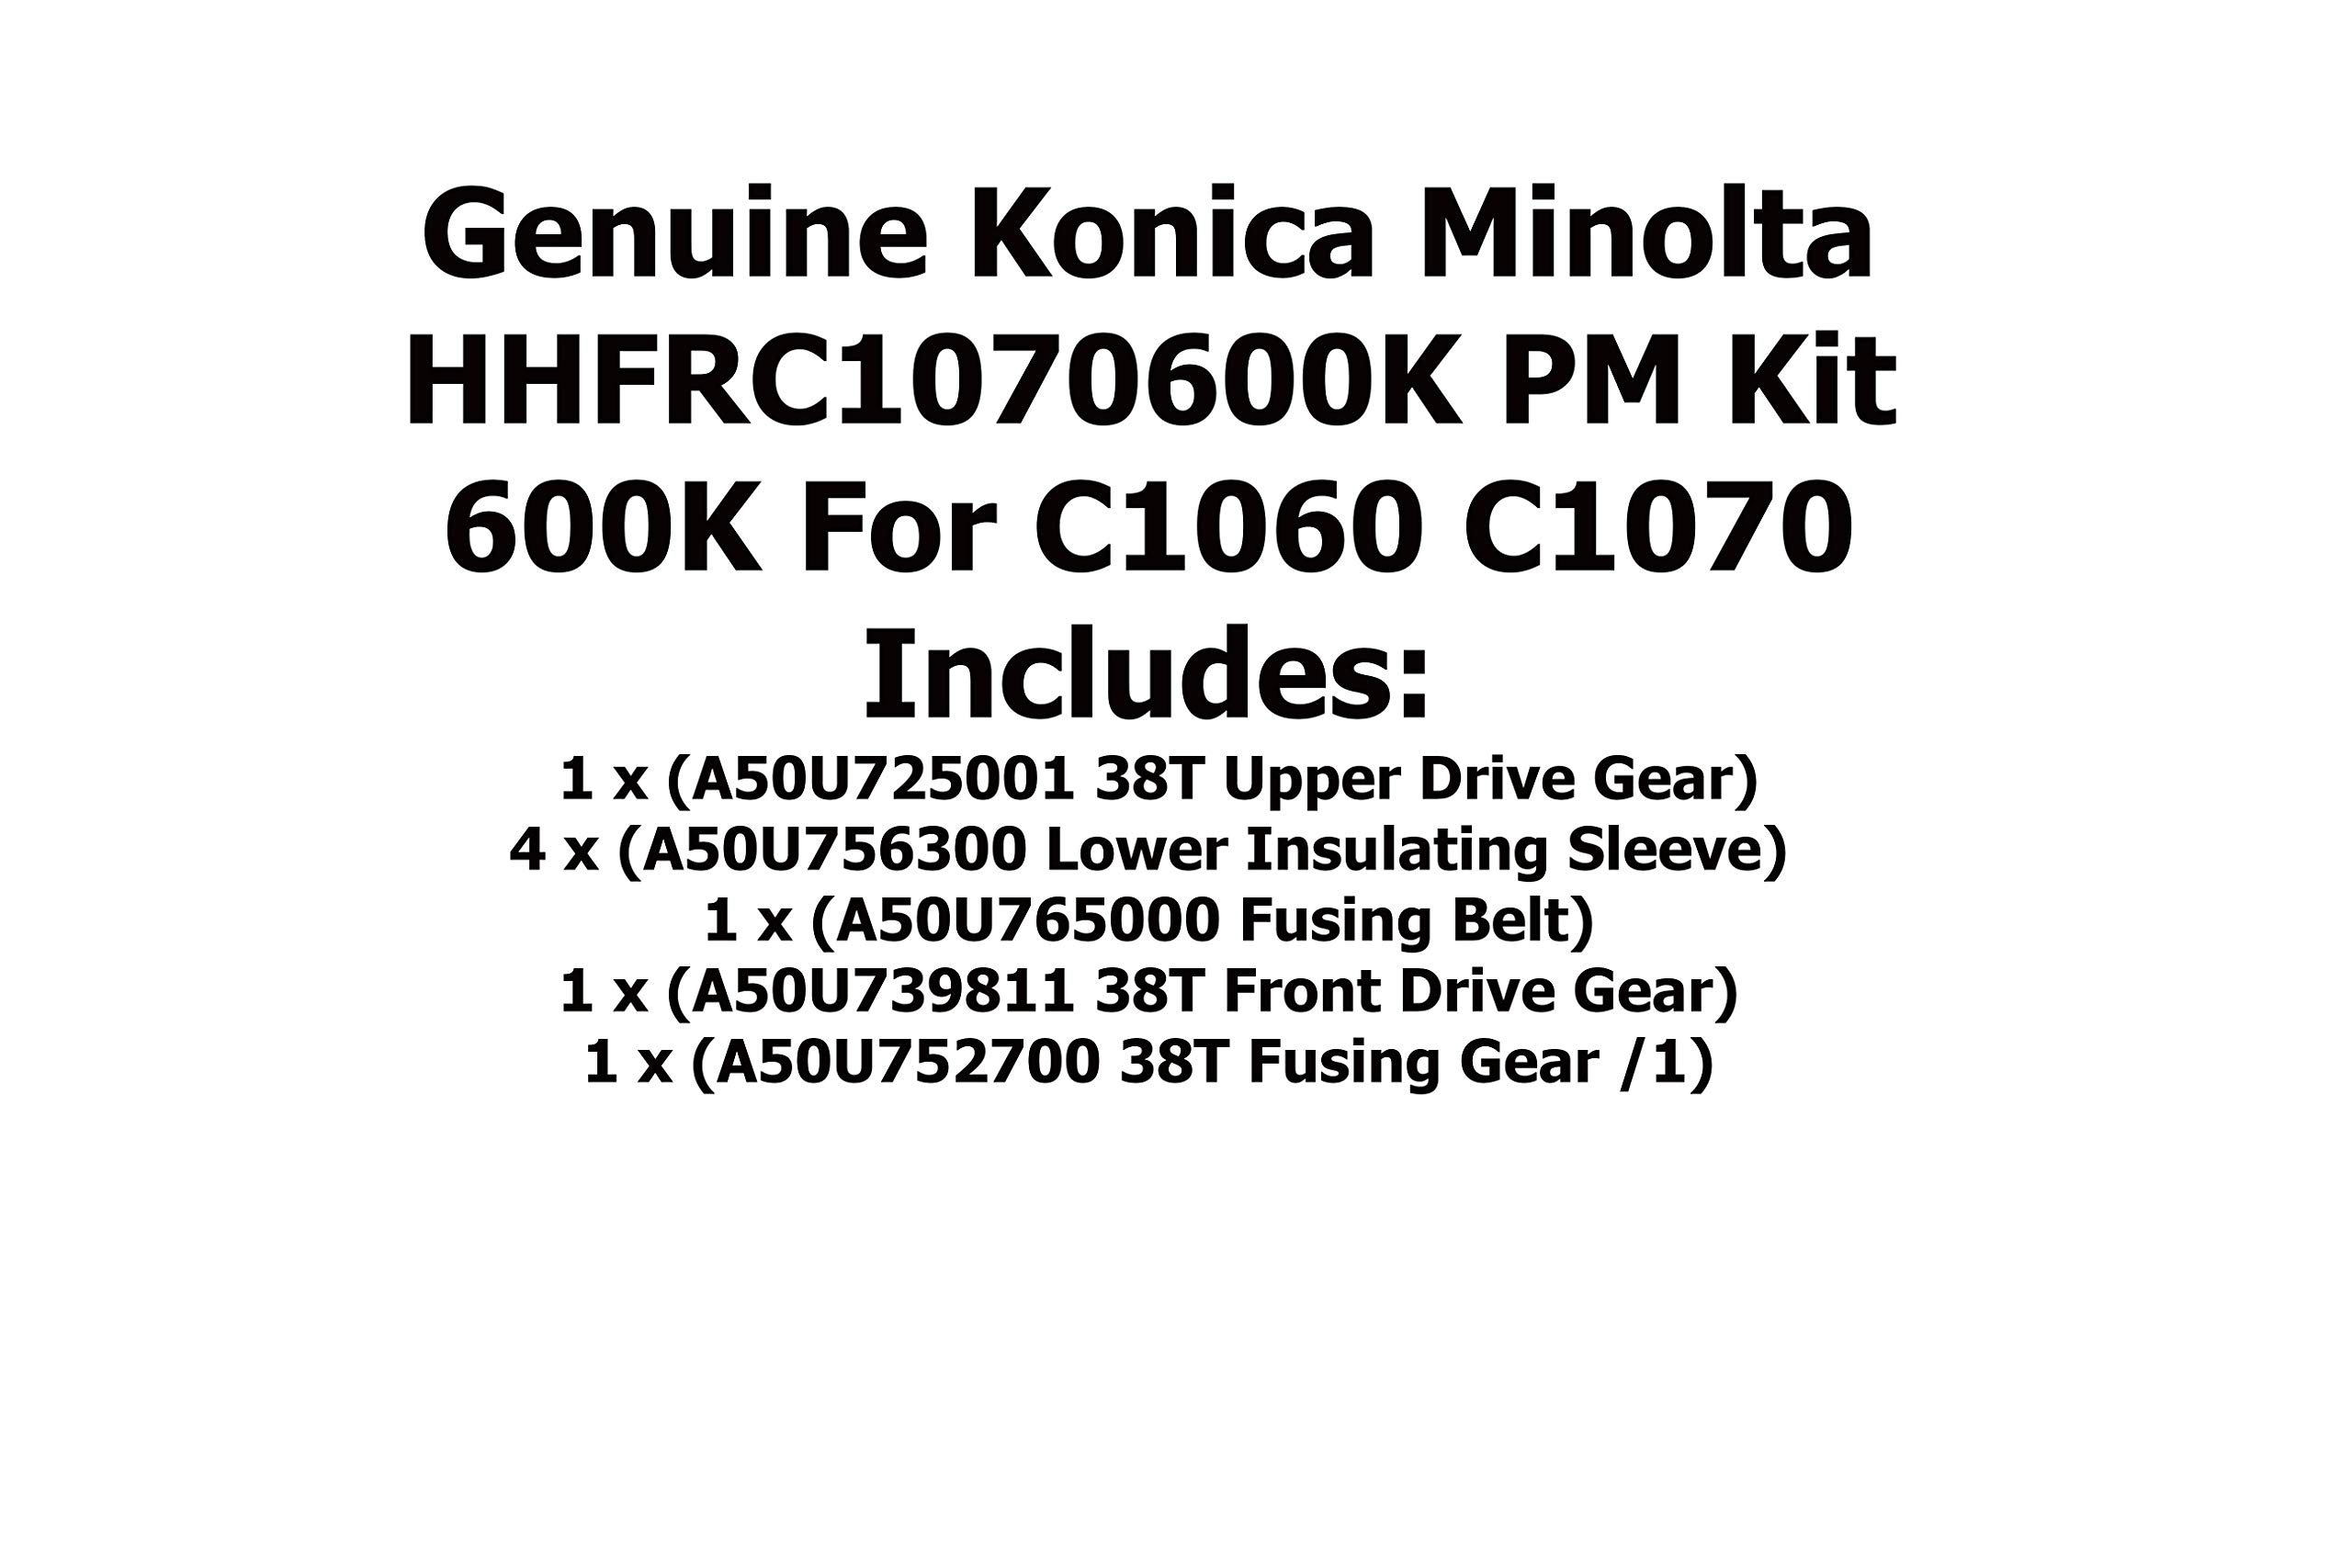 Genuine Konica Minolta HHFRC1070600K PM Kit 600K for C1060 C1070